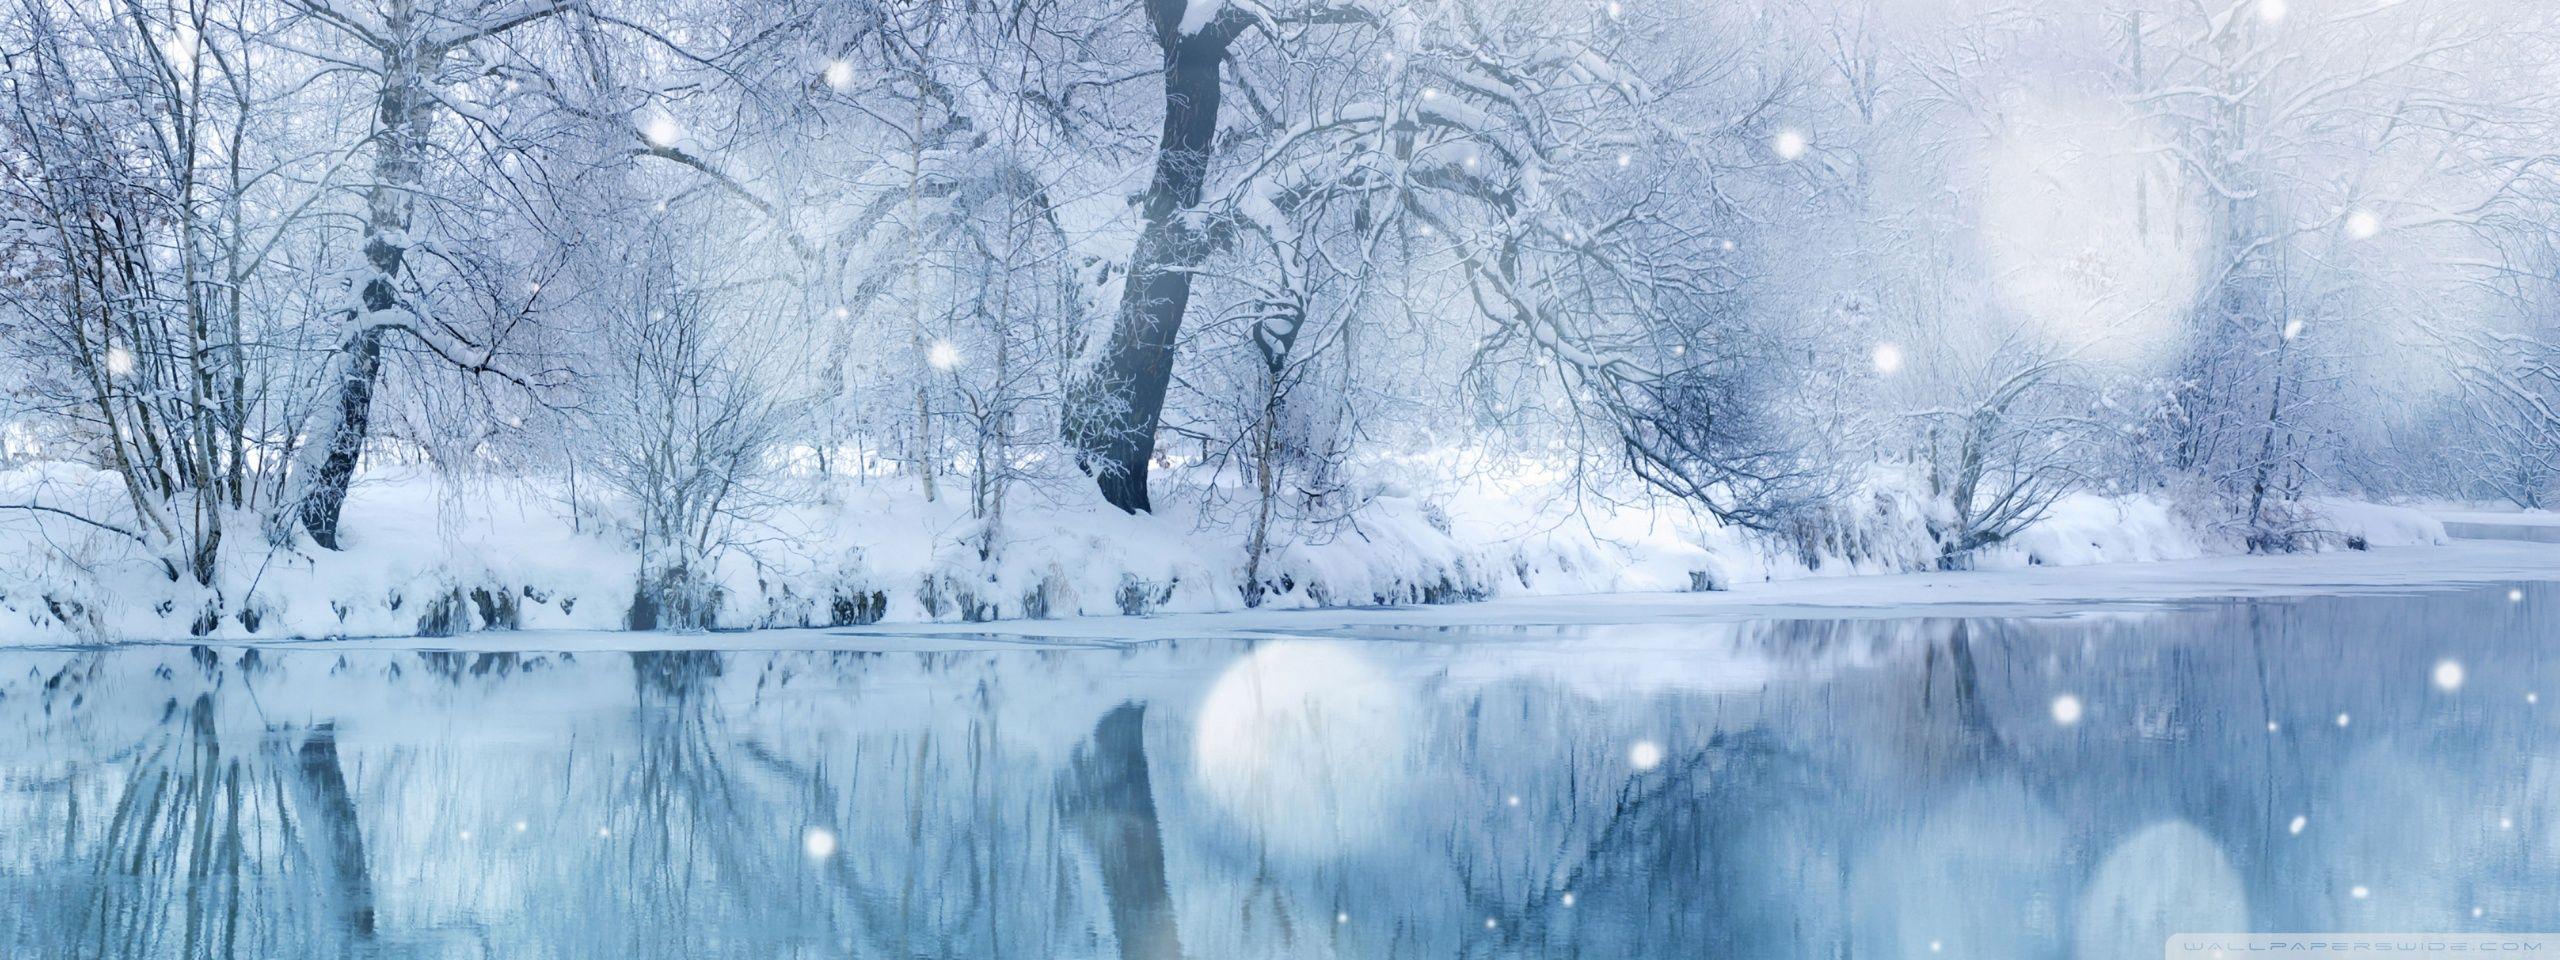 Winter Snowfall Hd Desktop Wallpaper High Definition Mobile